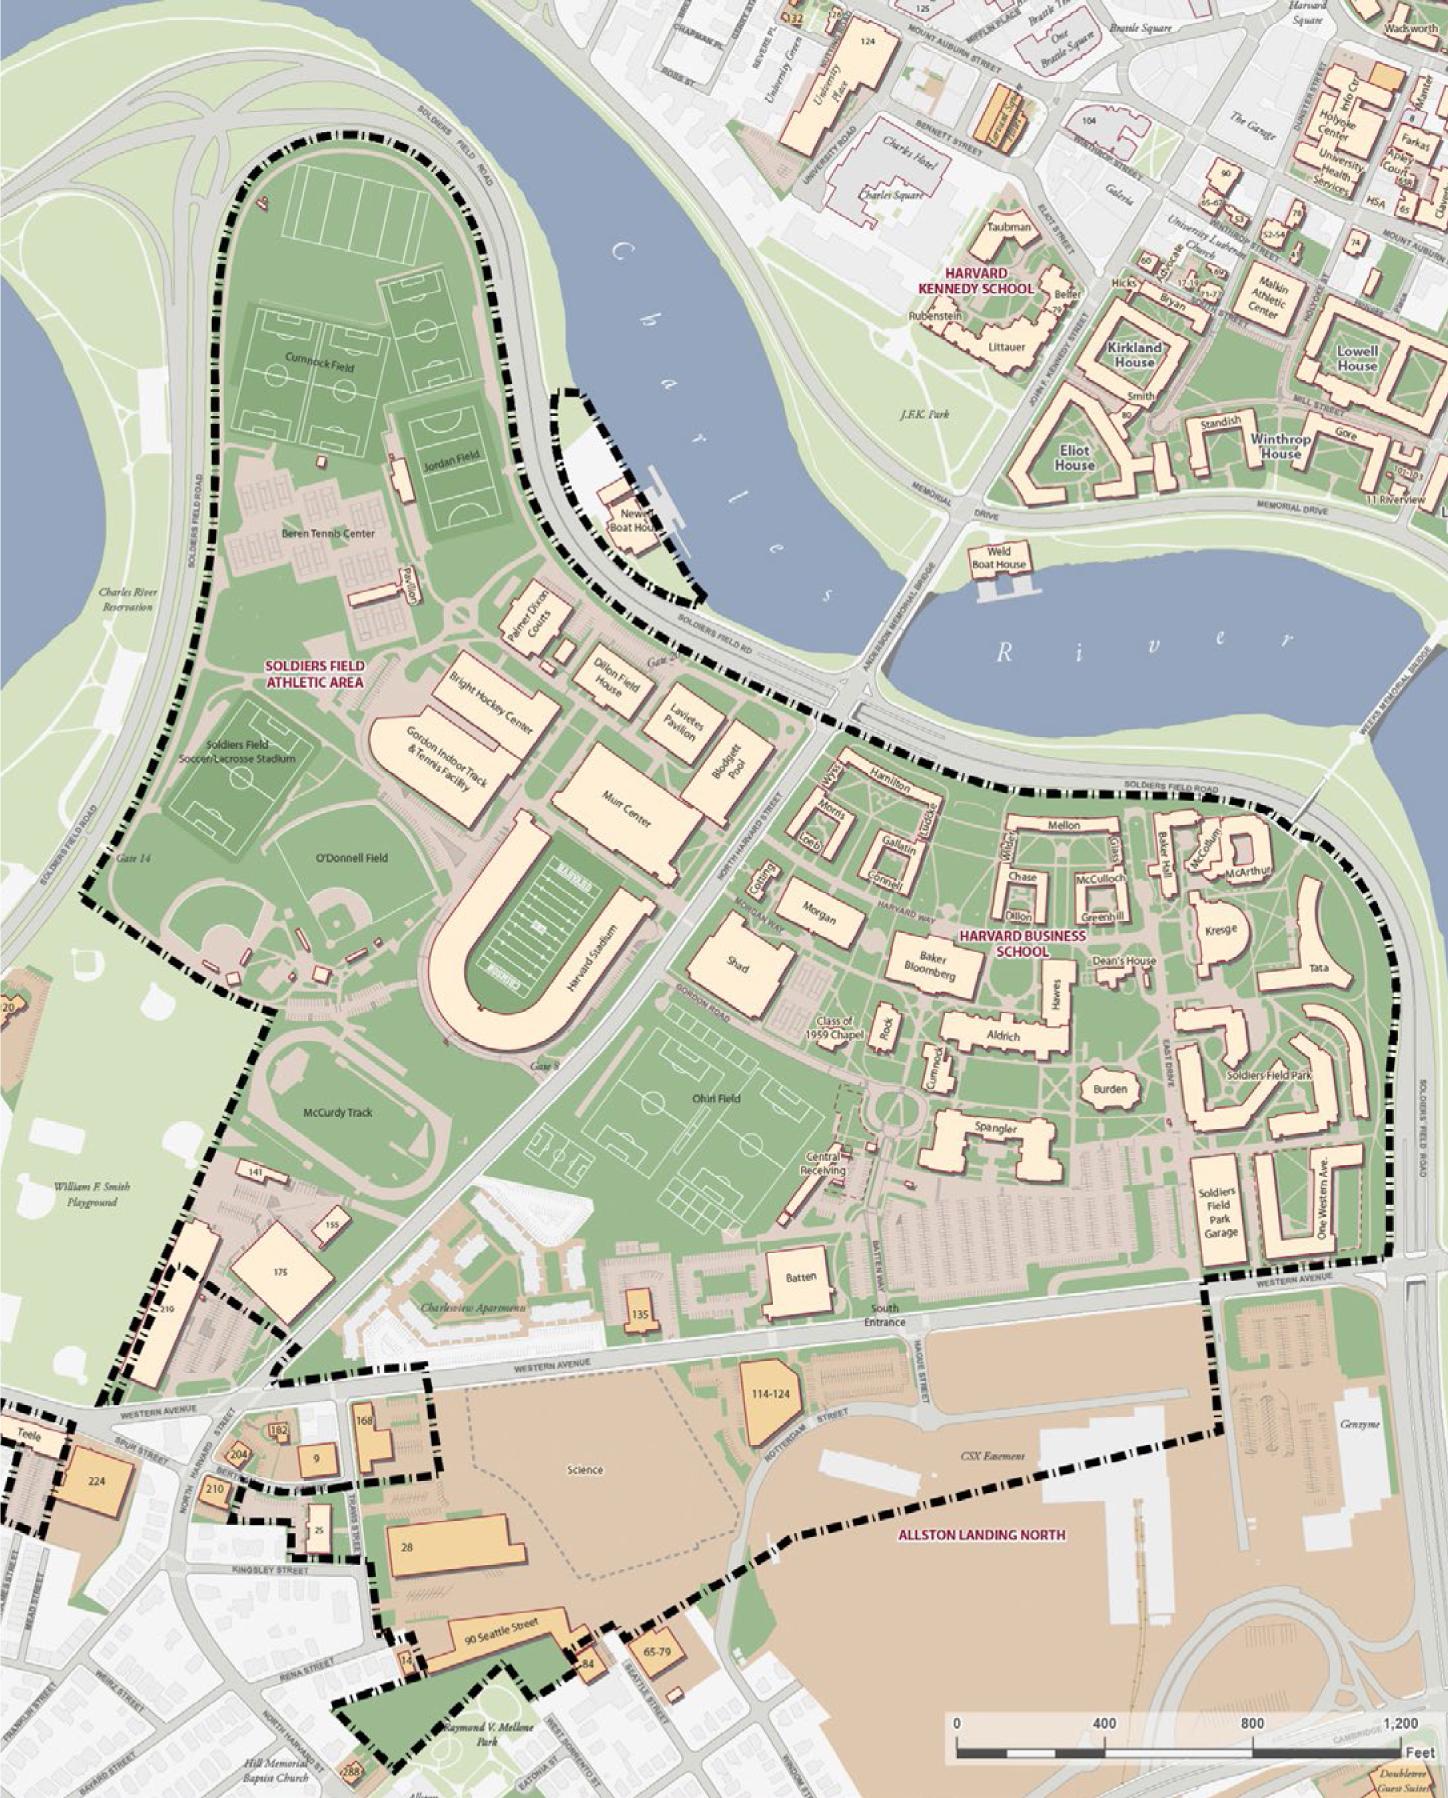 Harvard Classroom Design : Harvard files institutional master plan for allston with